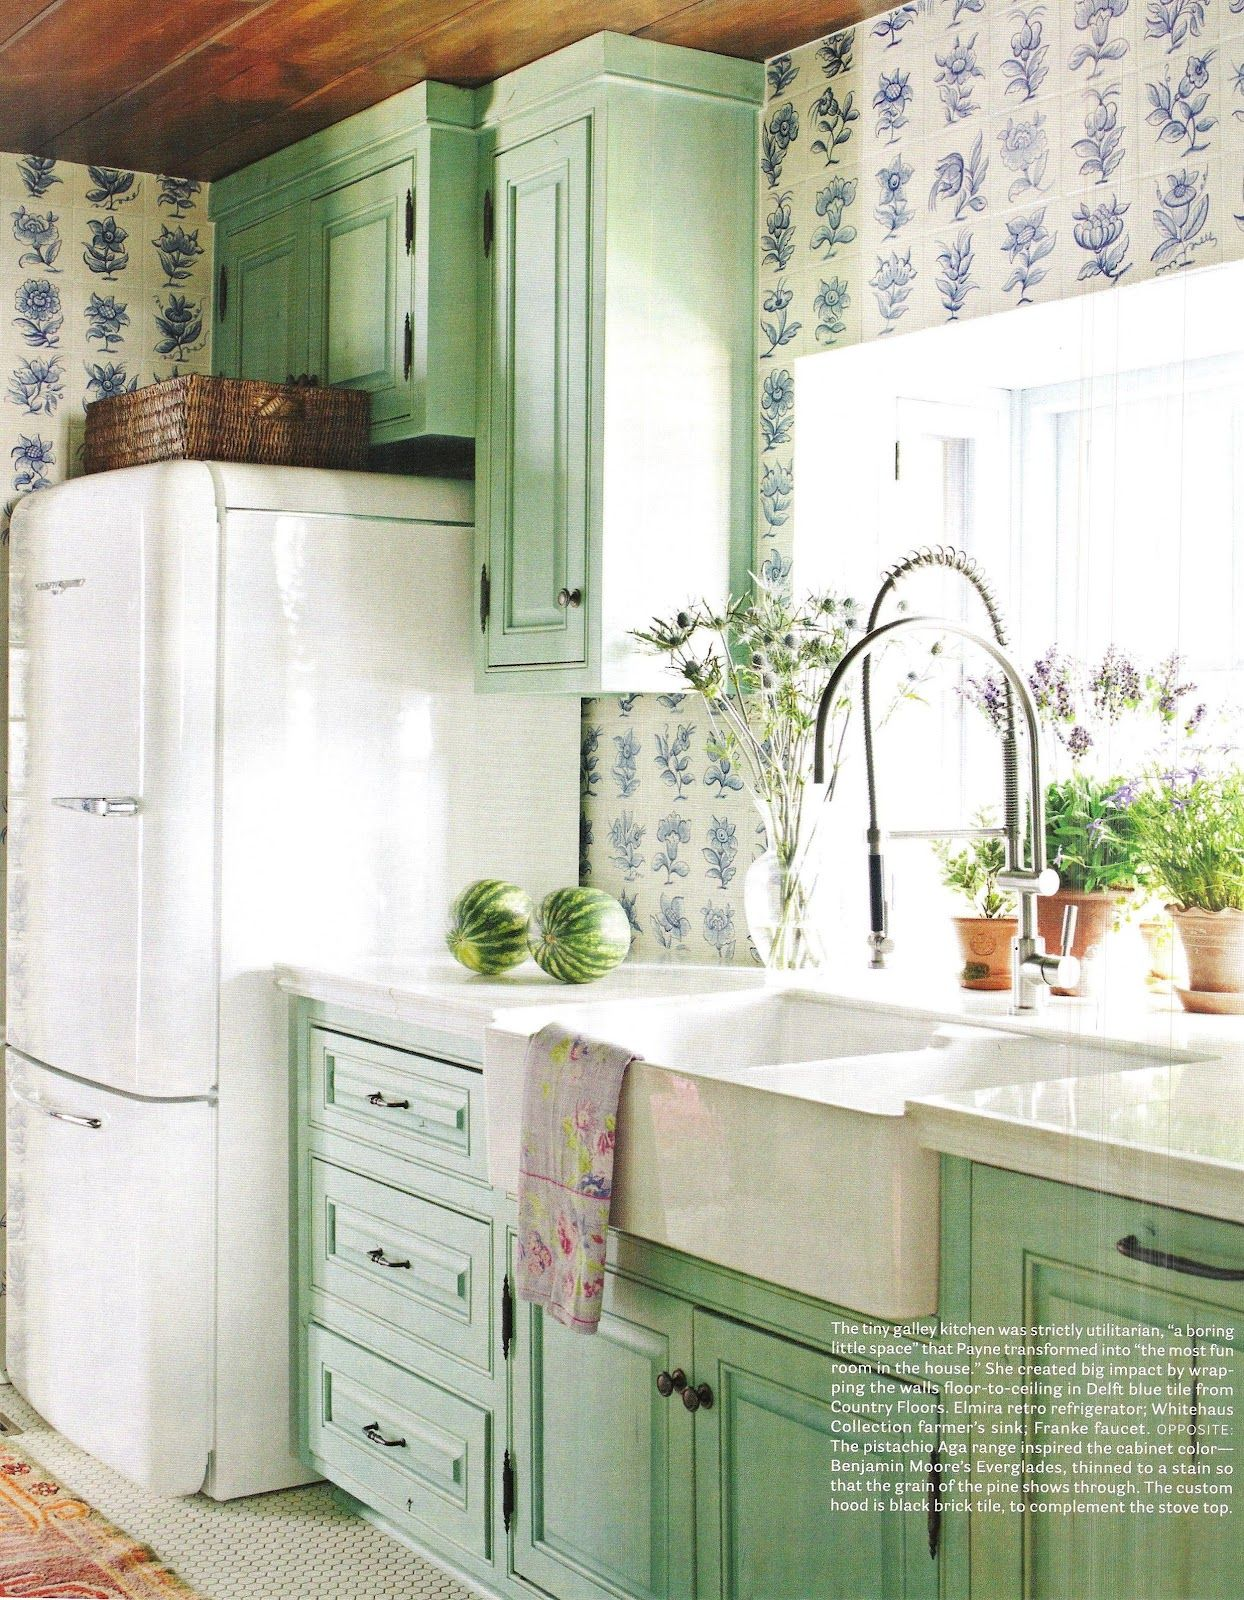 Ice Box A Flippen Life 1950 s kitchen design